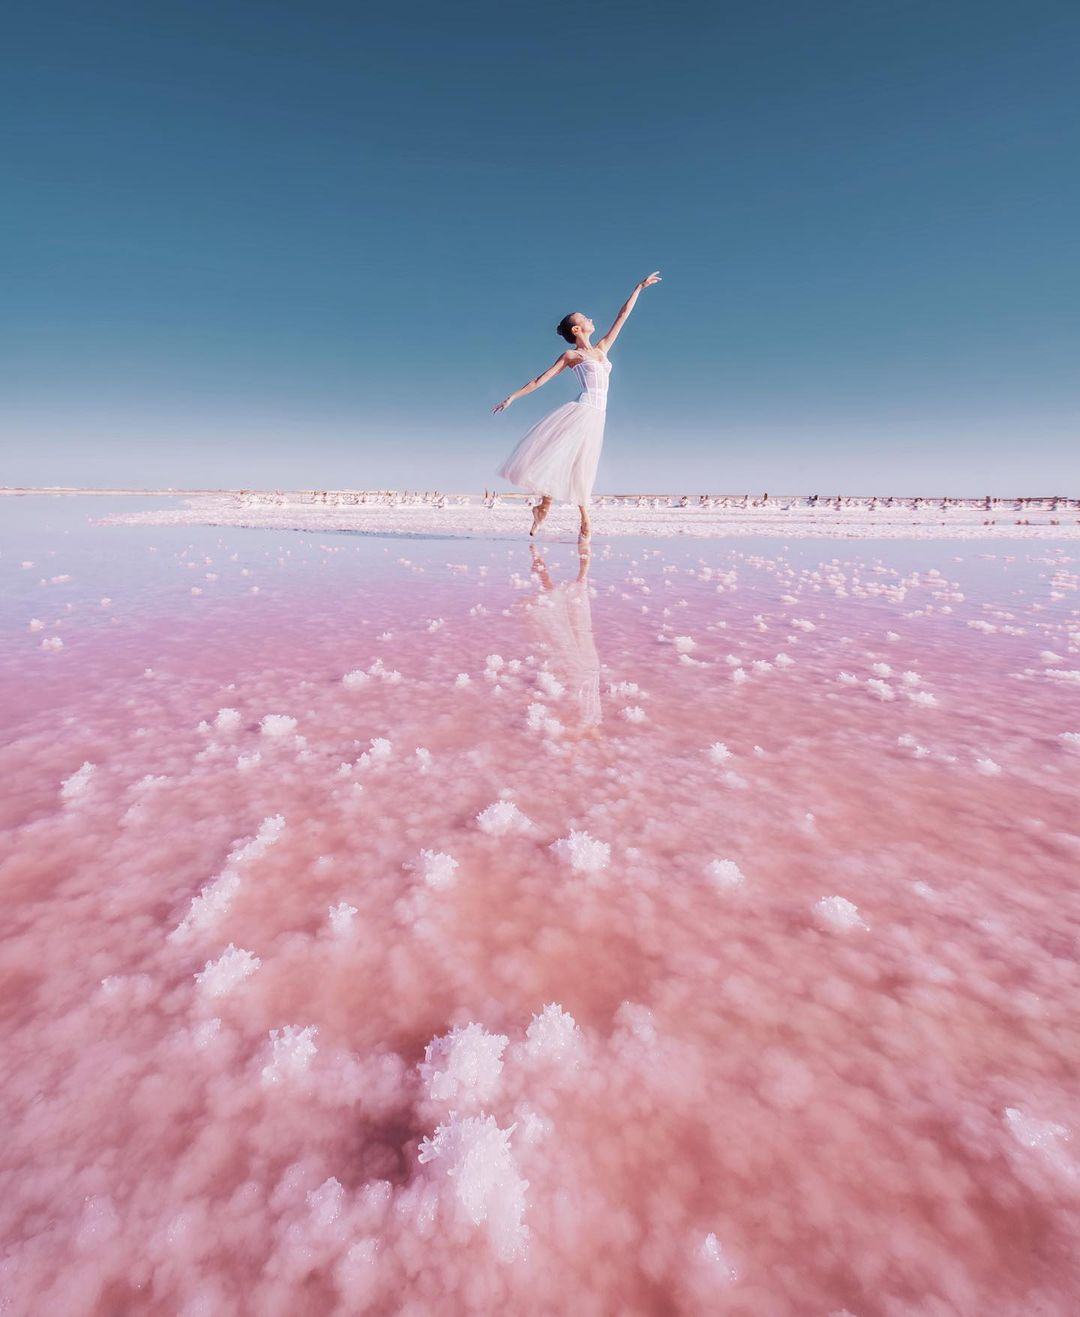 most beautiful photo by tobias pedro luis ajuriaguerra